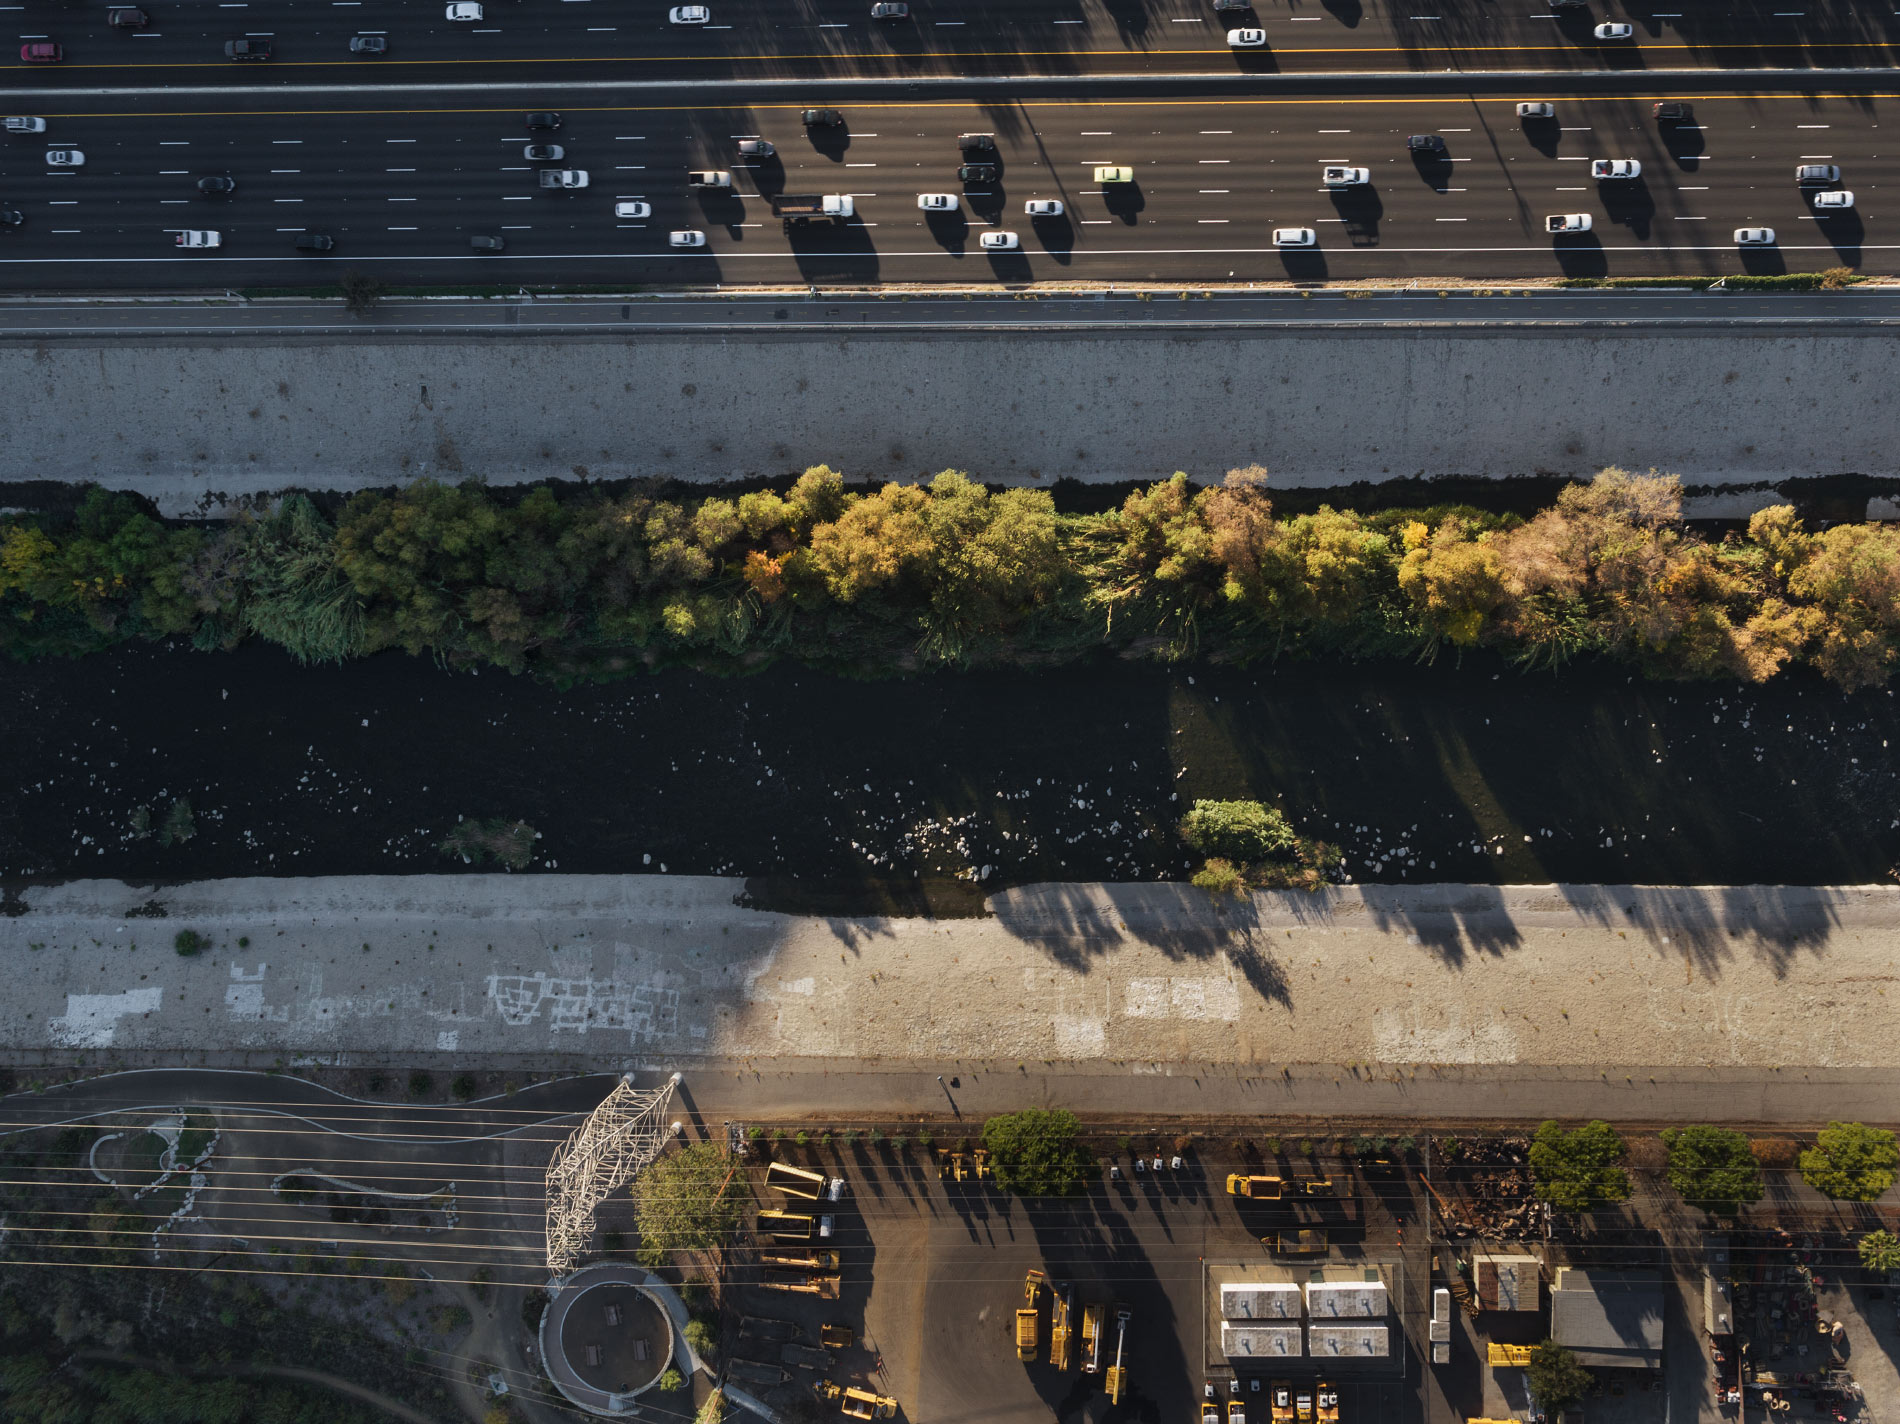 LA_River_drone_151207_03.jpg